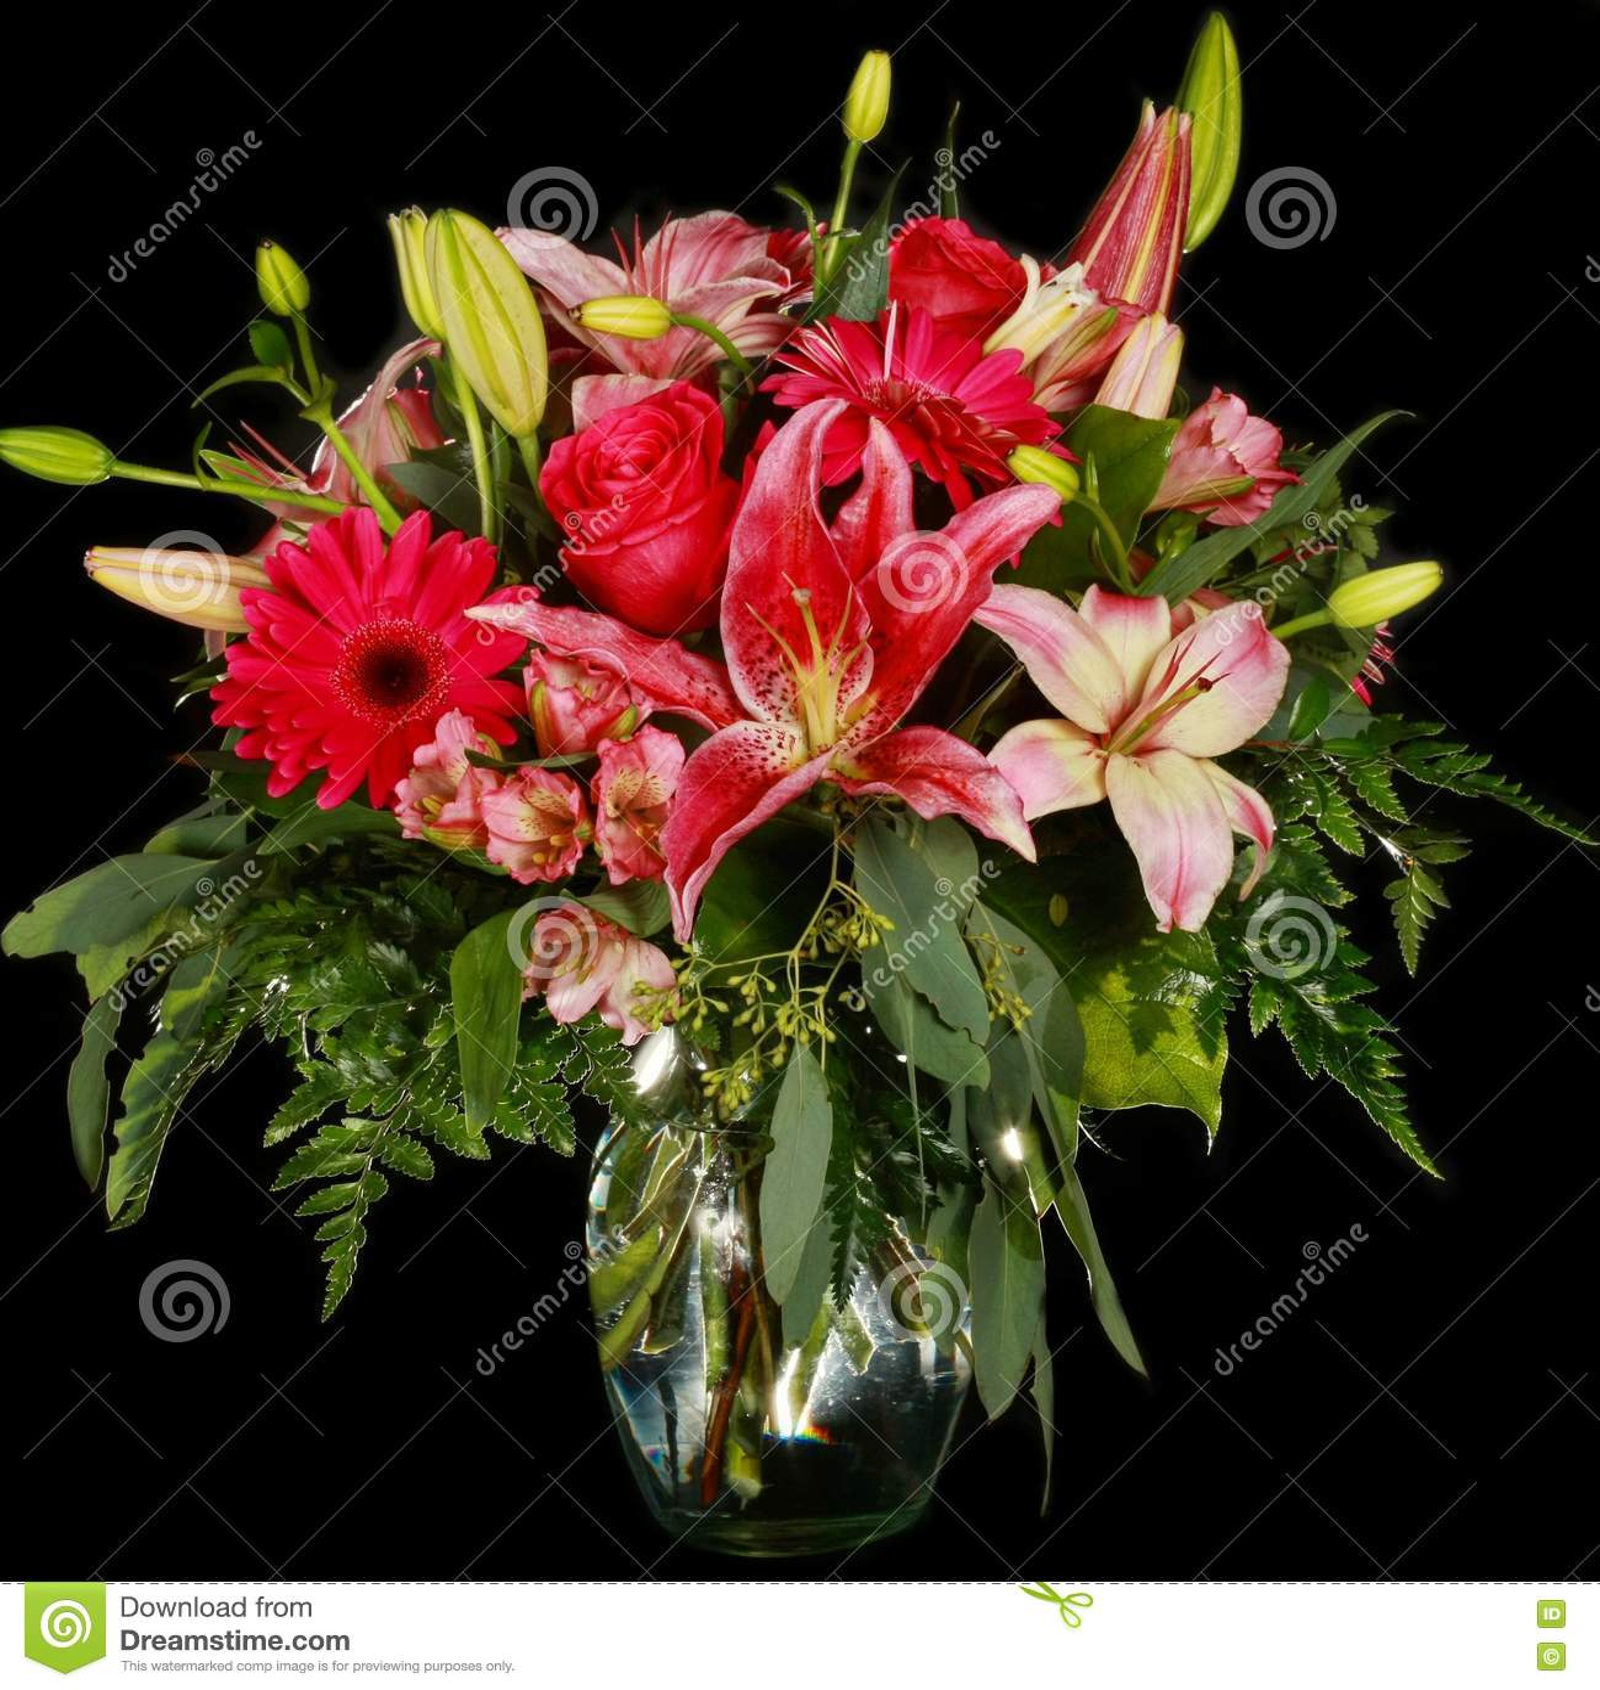 Hot Pink Flower Arrangement Stock Image Image Of Glass Hydrangea